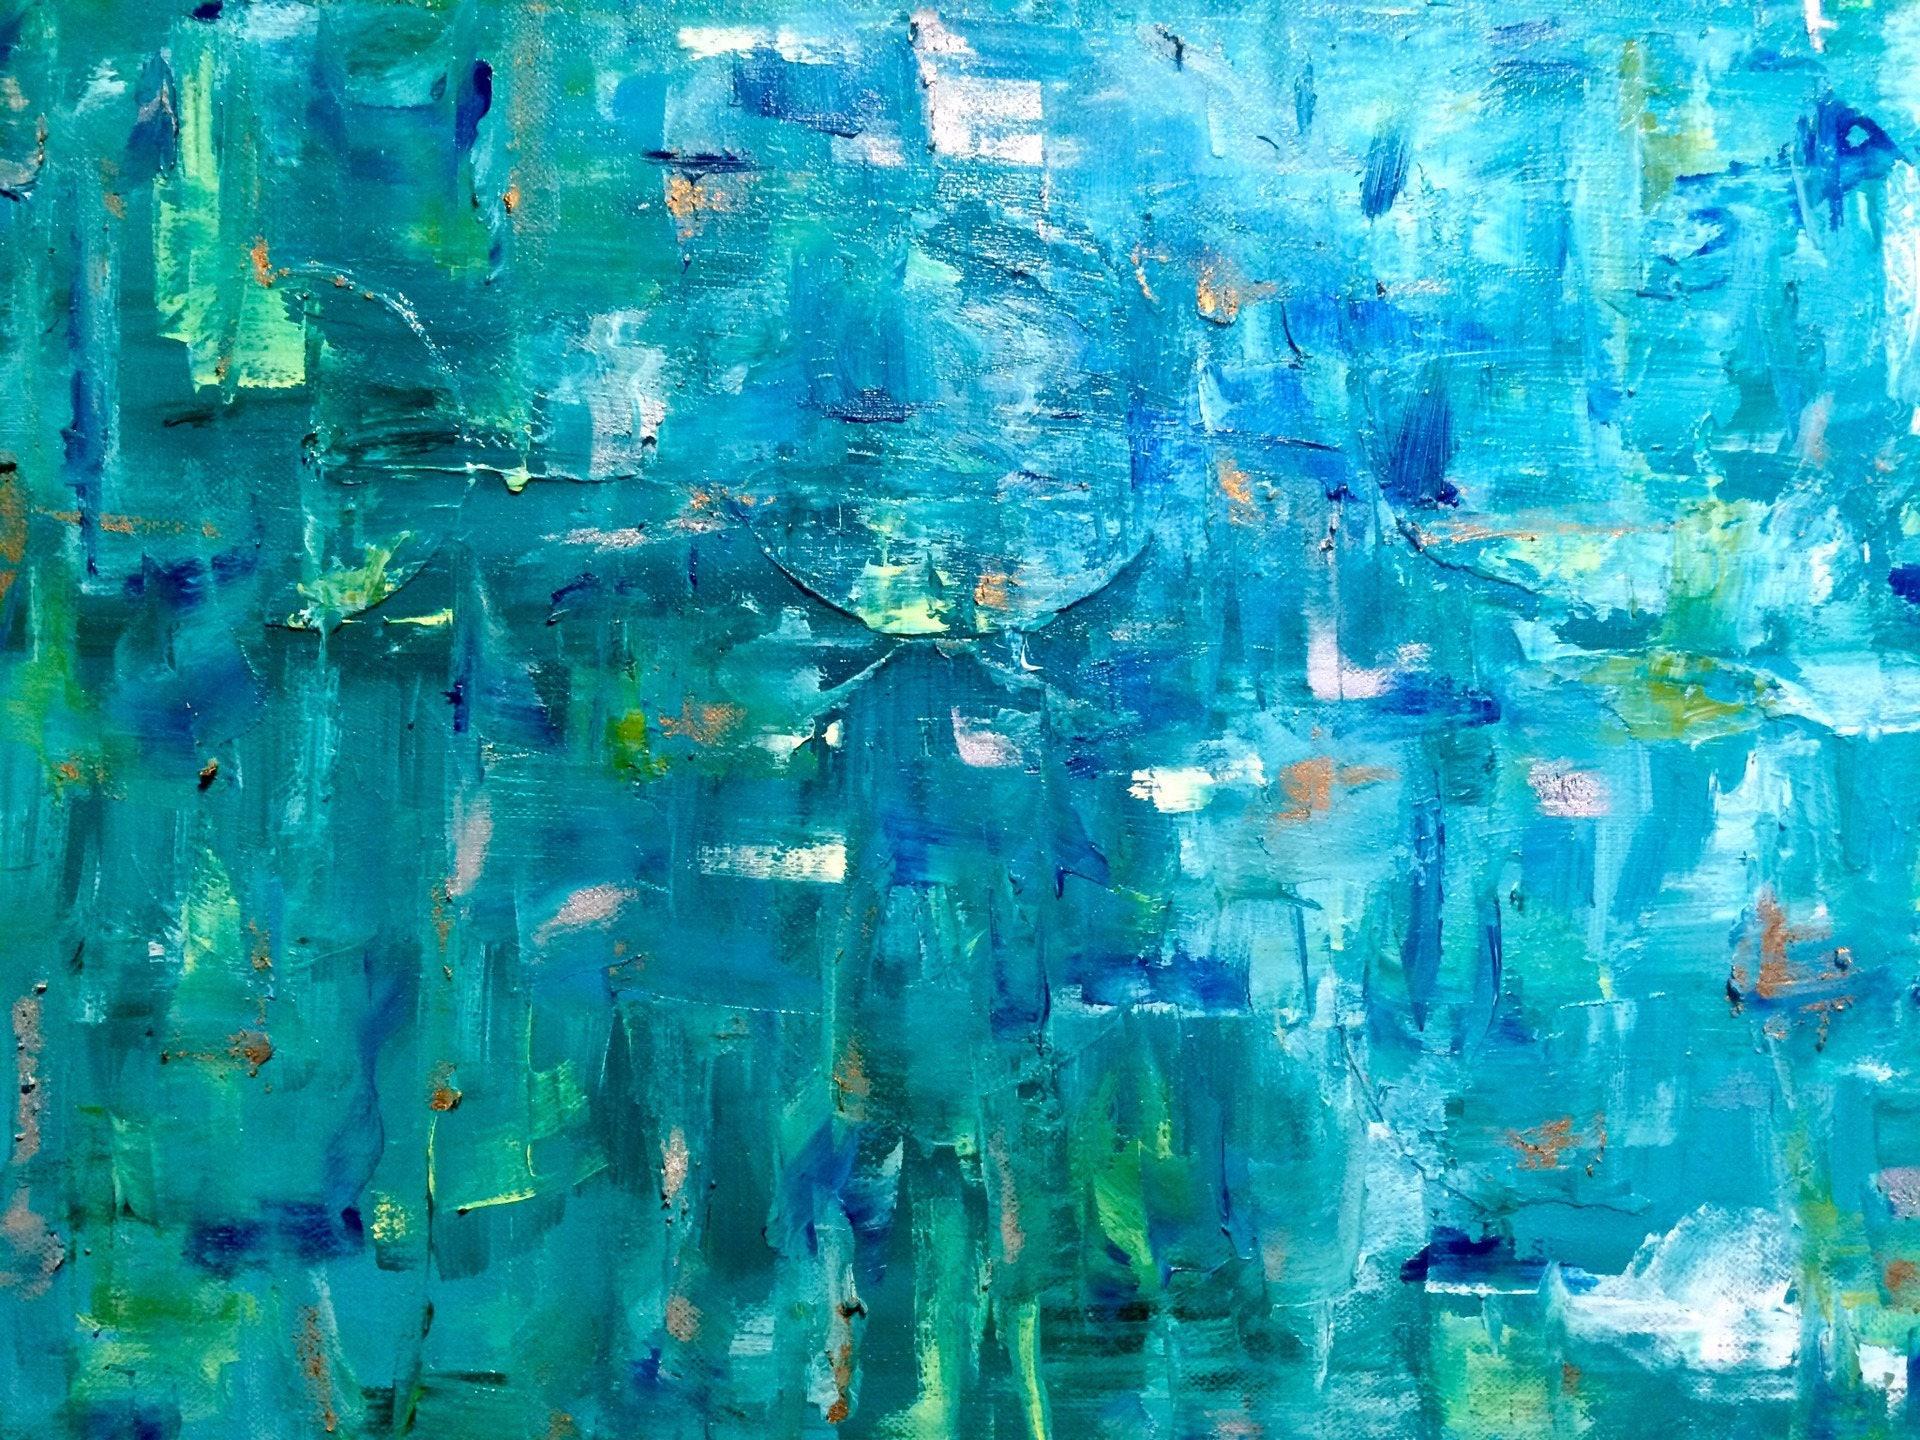 Art moderne bleu vert turquoise aquatique peinture for Peinture bleu turquoise